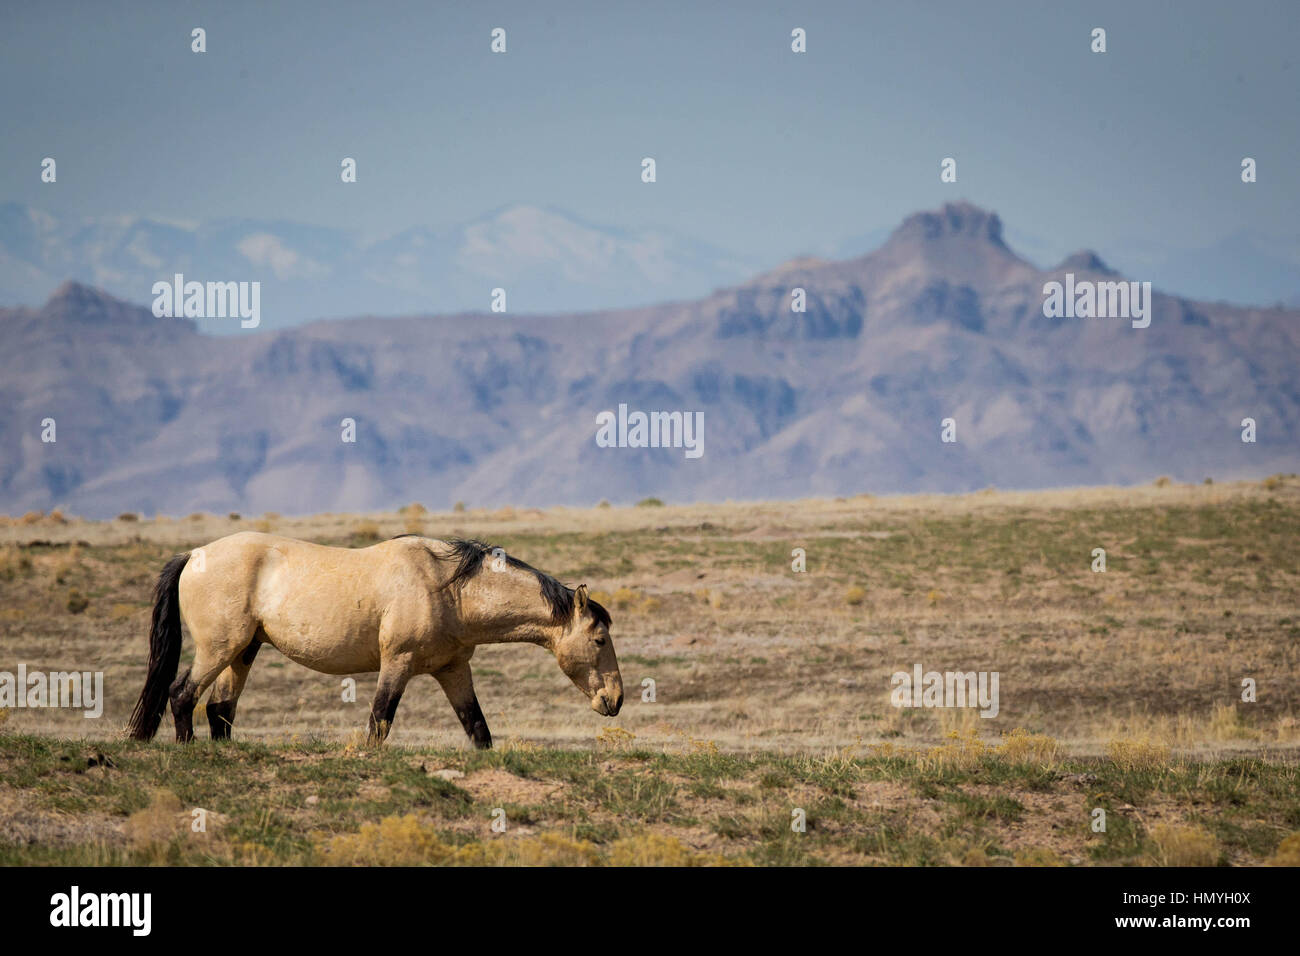 Stock Kiger Mustang Wild Horse (Equus ferus caballus) in West Desert of Northern Utah, USA, North America Stock Photo